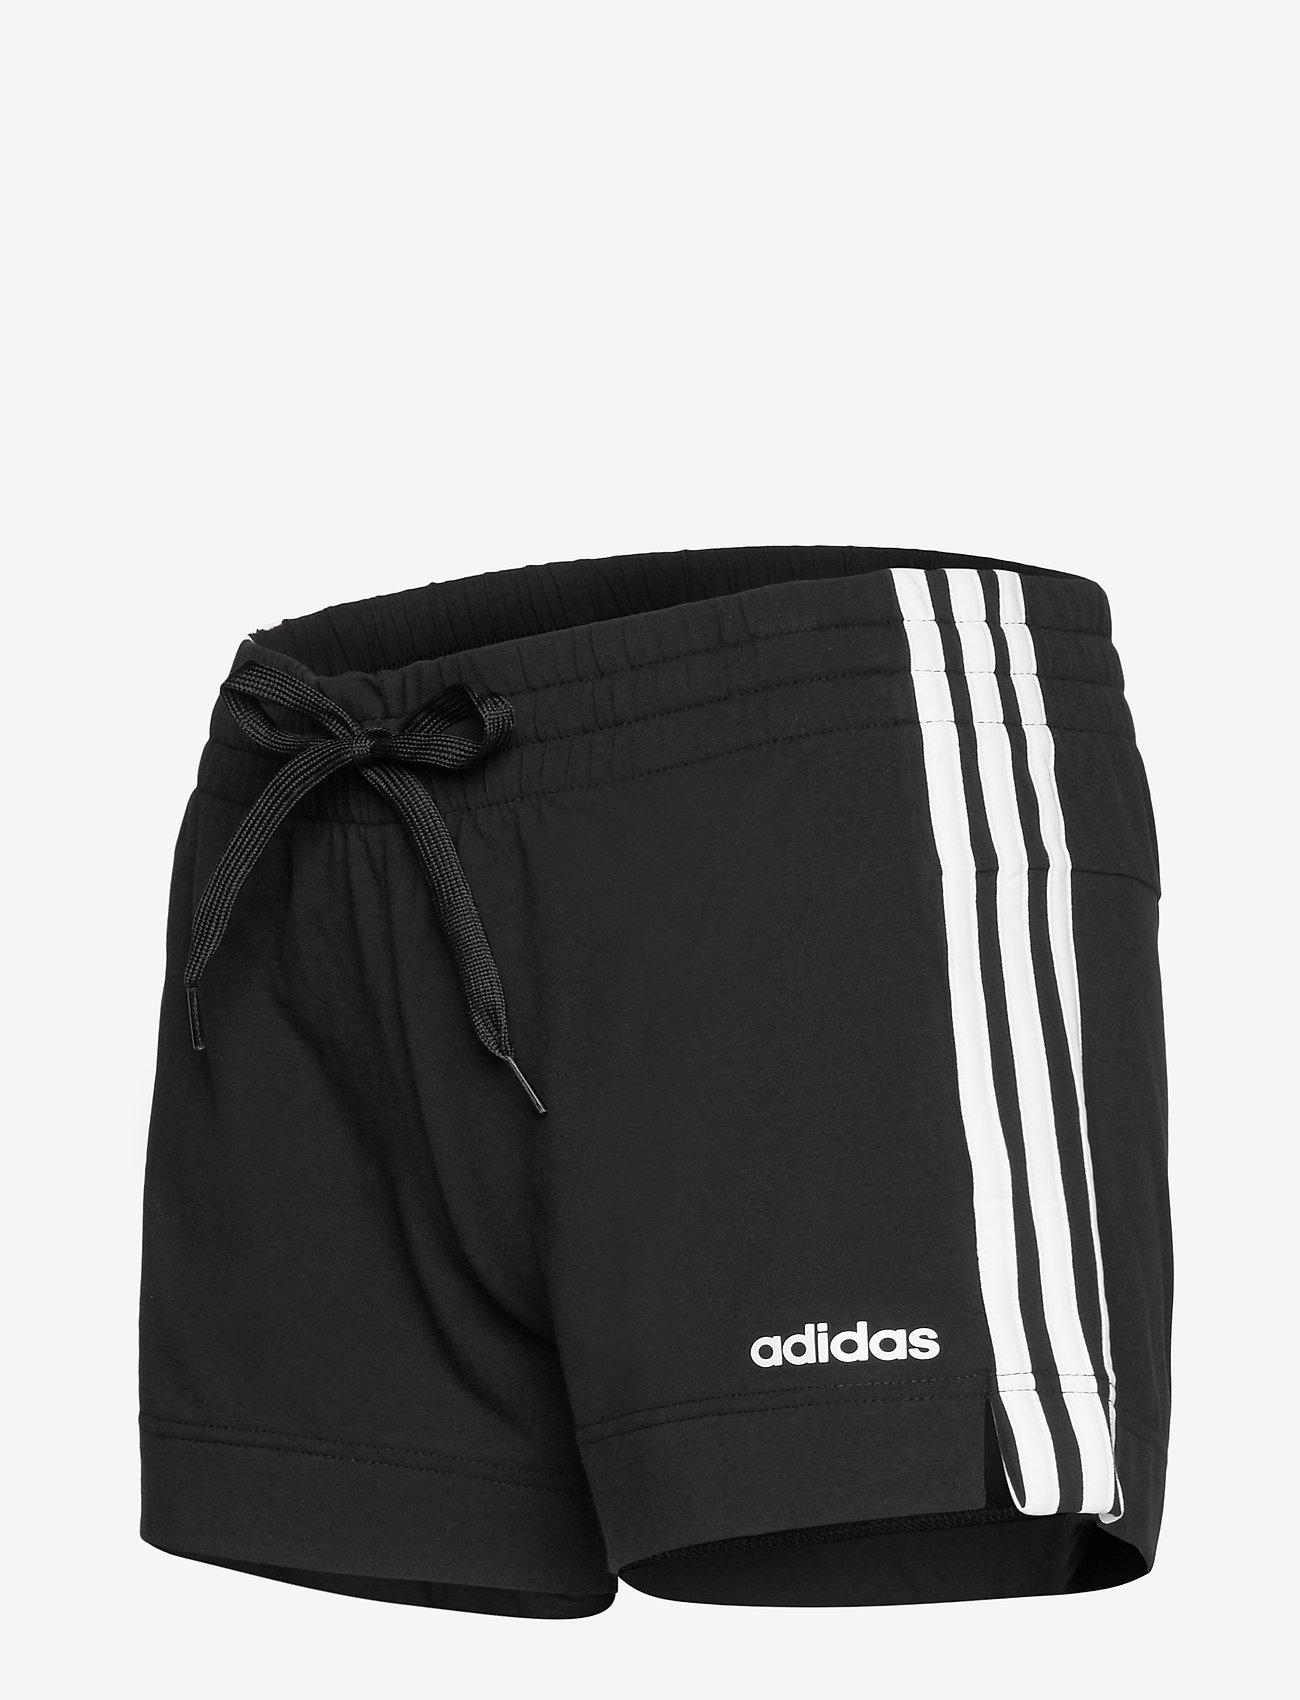 Adidas Performance W E 3s Short - Shorts Black/white